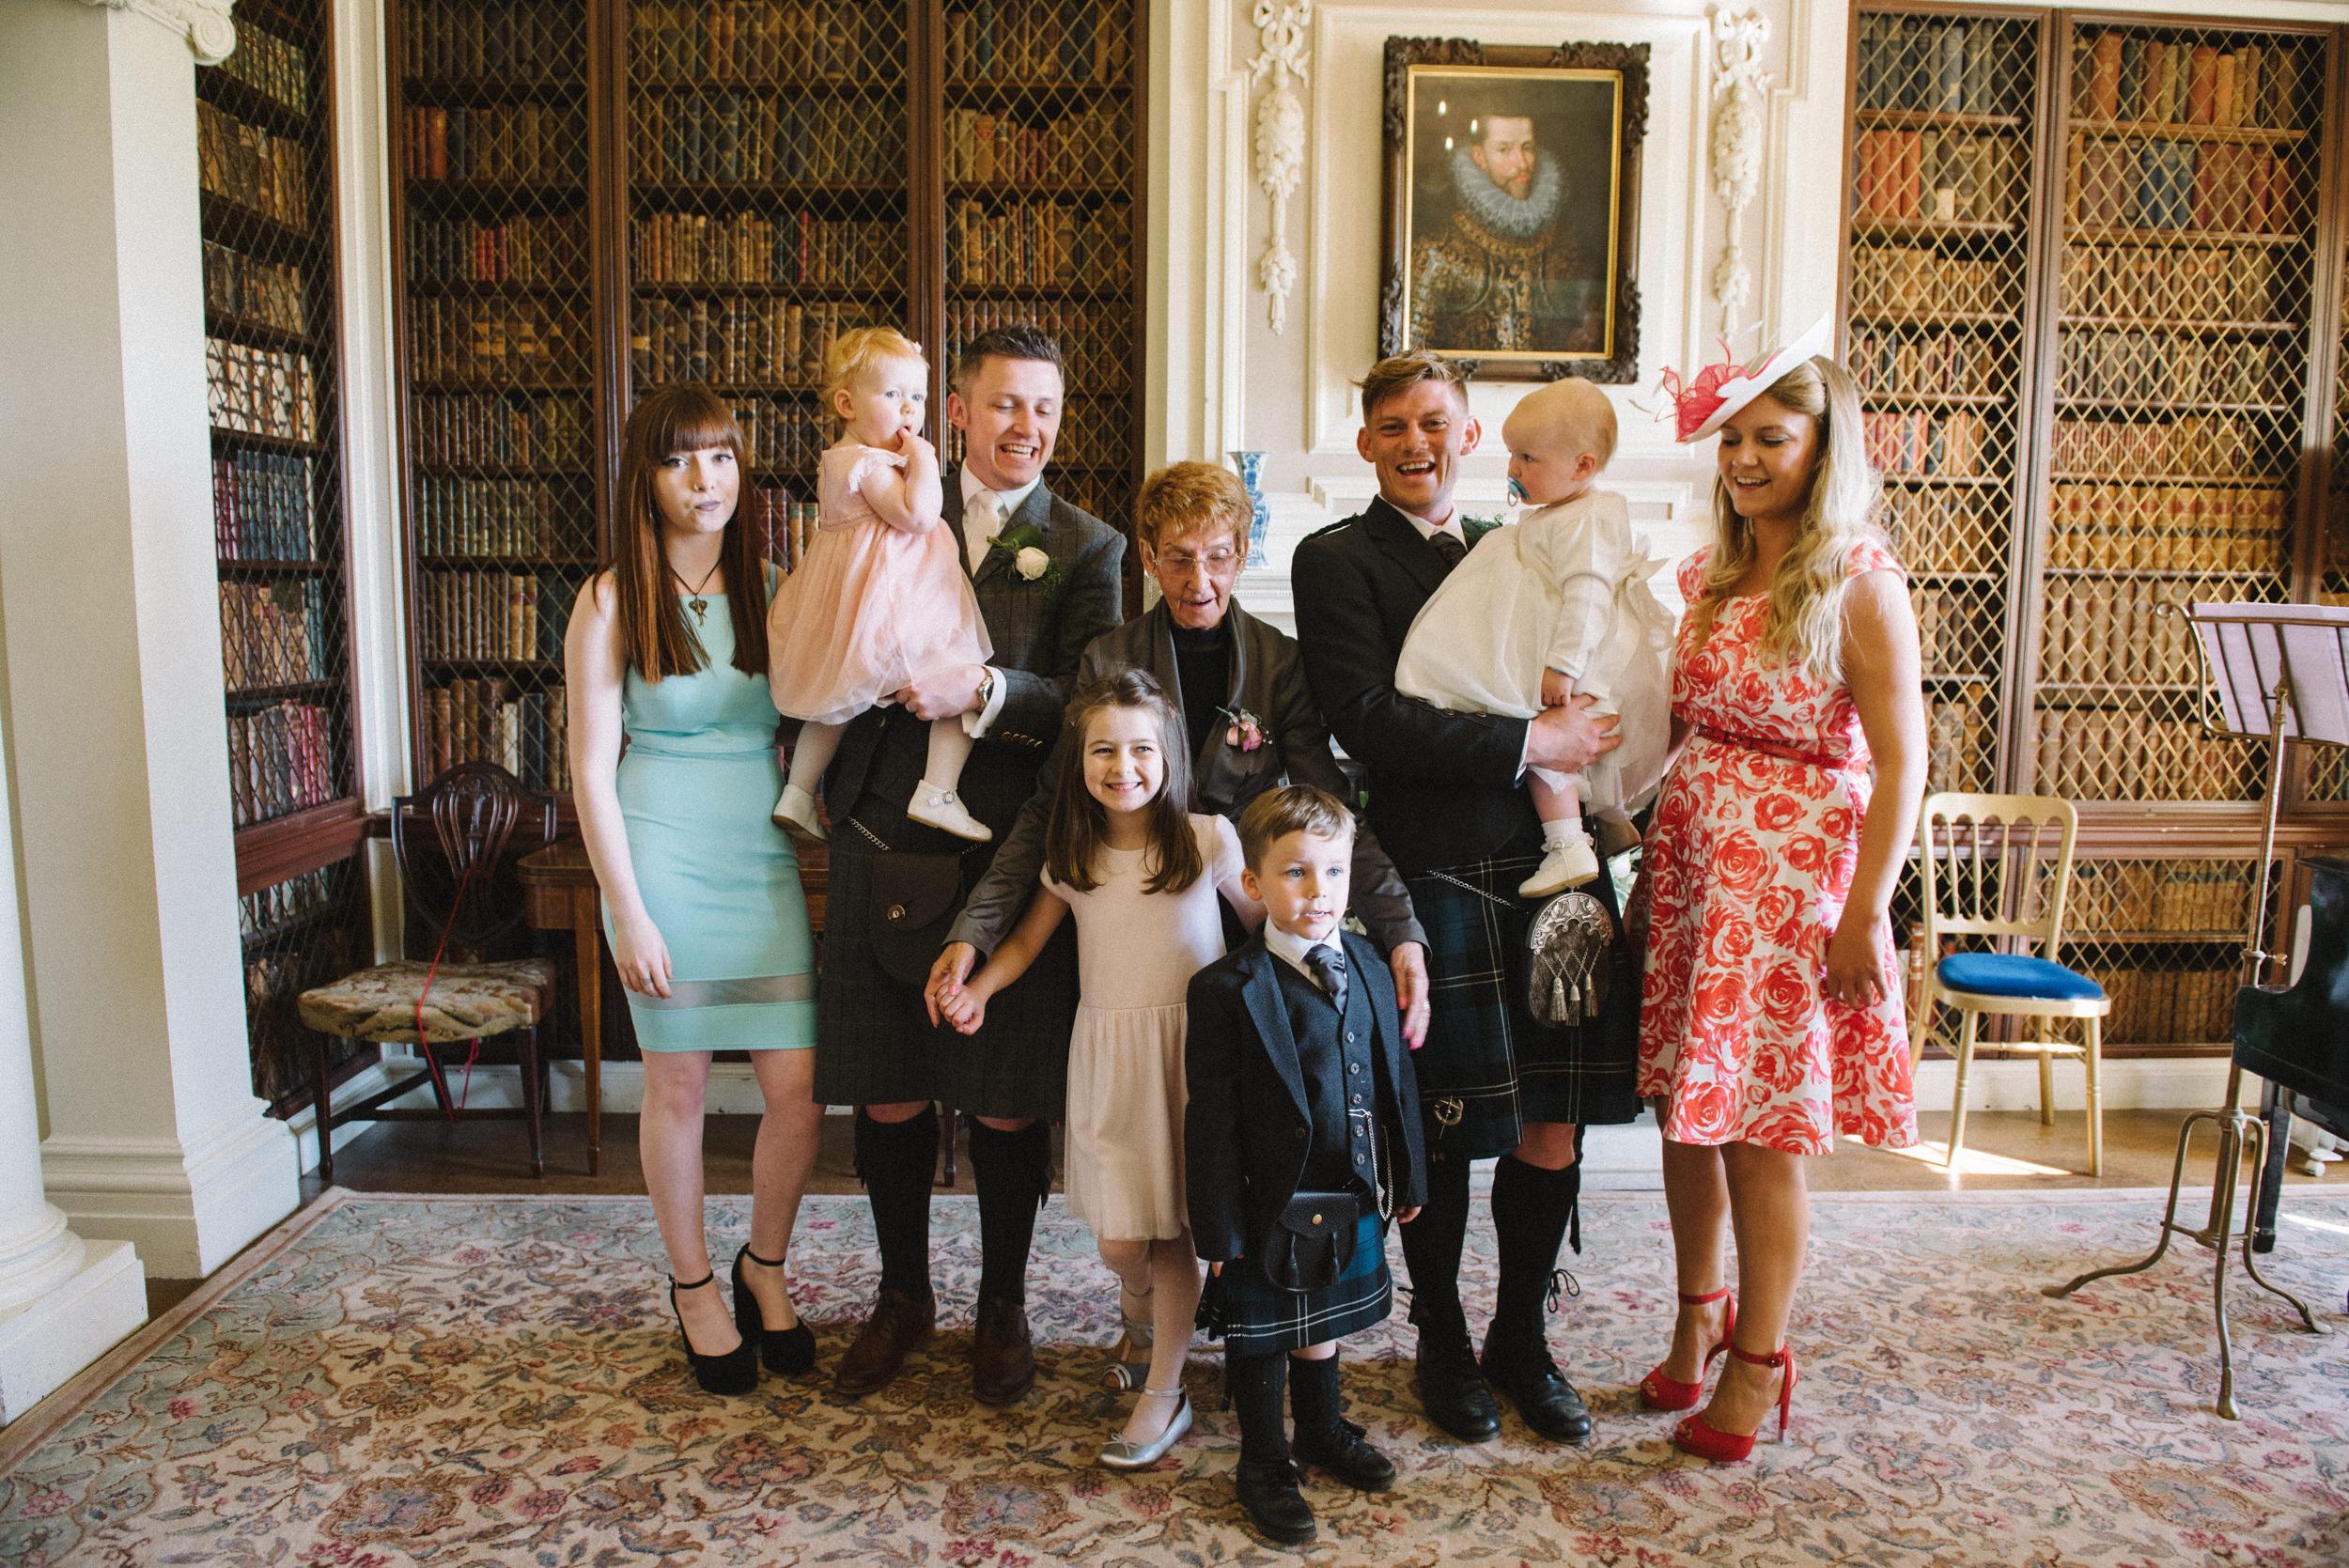 0027-alternative-wedding-portrait-family-kids-photographer-glasgow-scotland.JPG